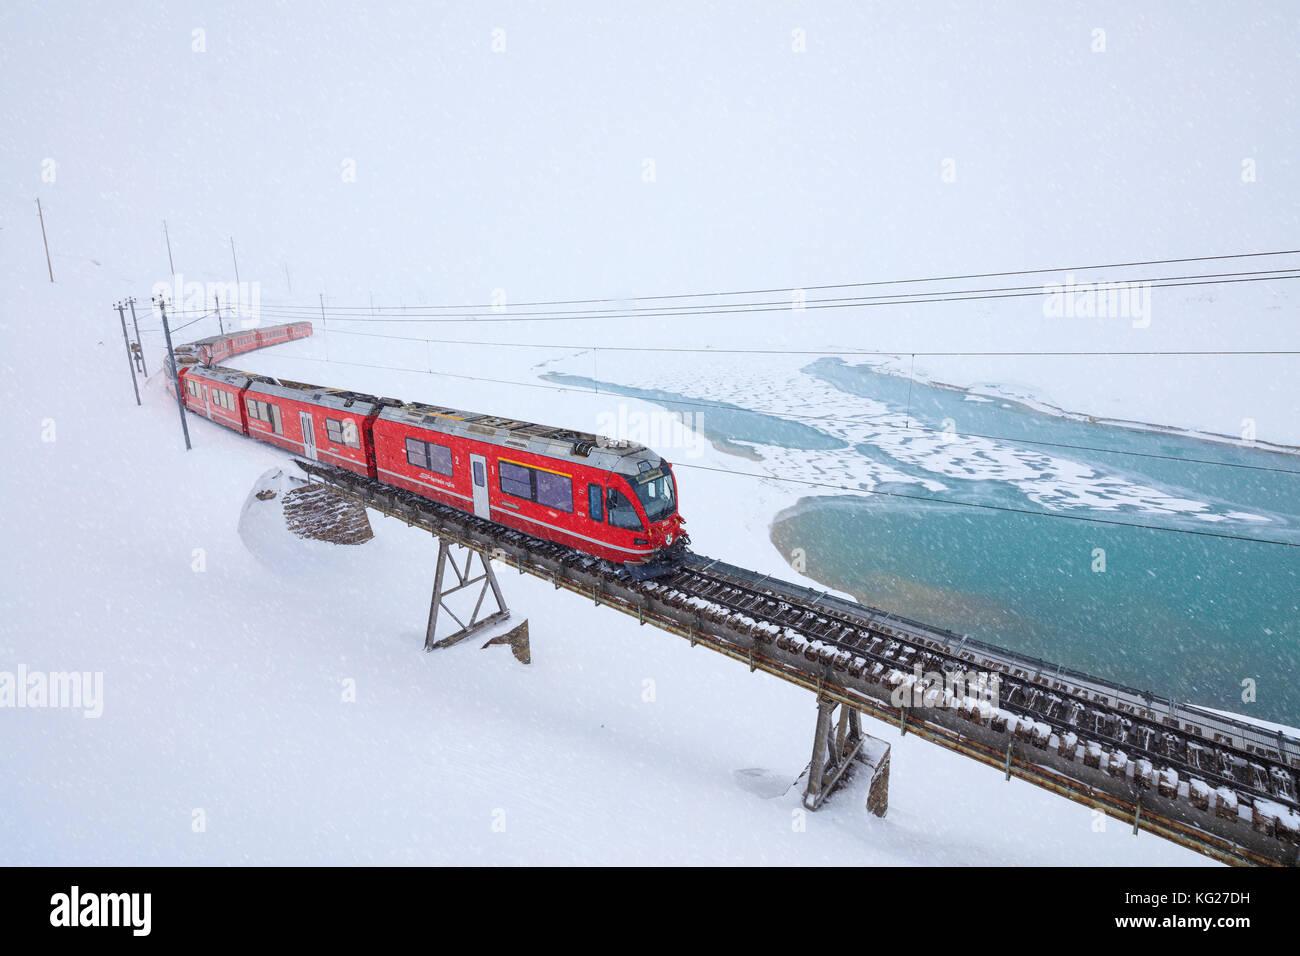 Bernina Express am Berninapass nach einem Schneefall, im Engadin, Kanton Graubünden, Schweiz, Europa Stockbild